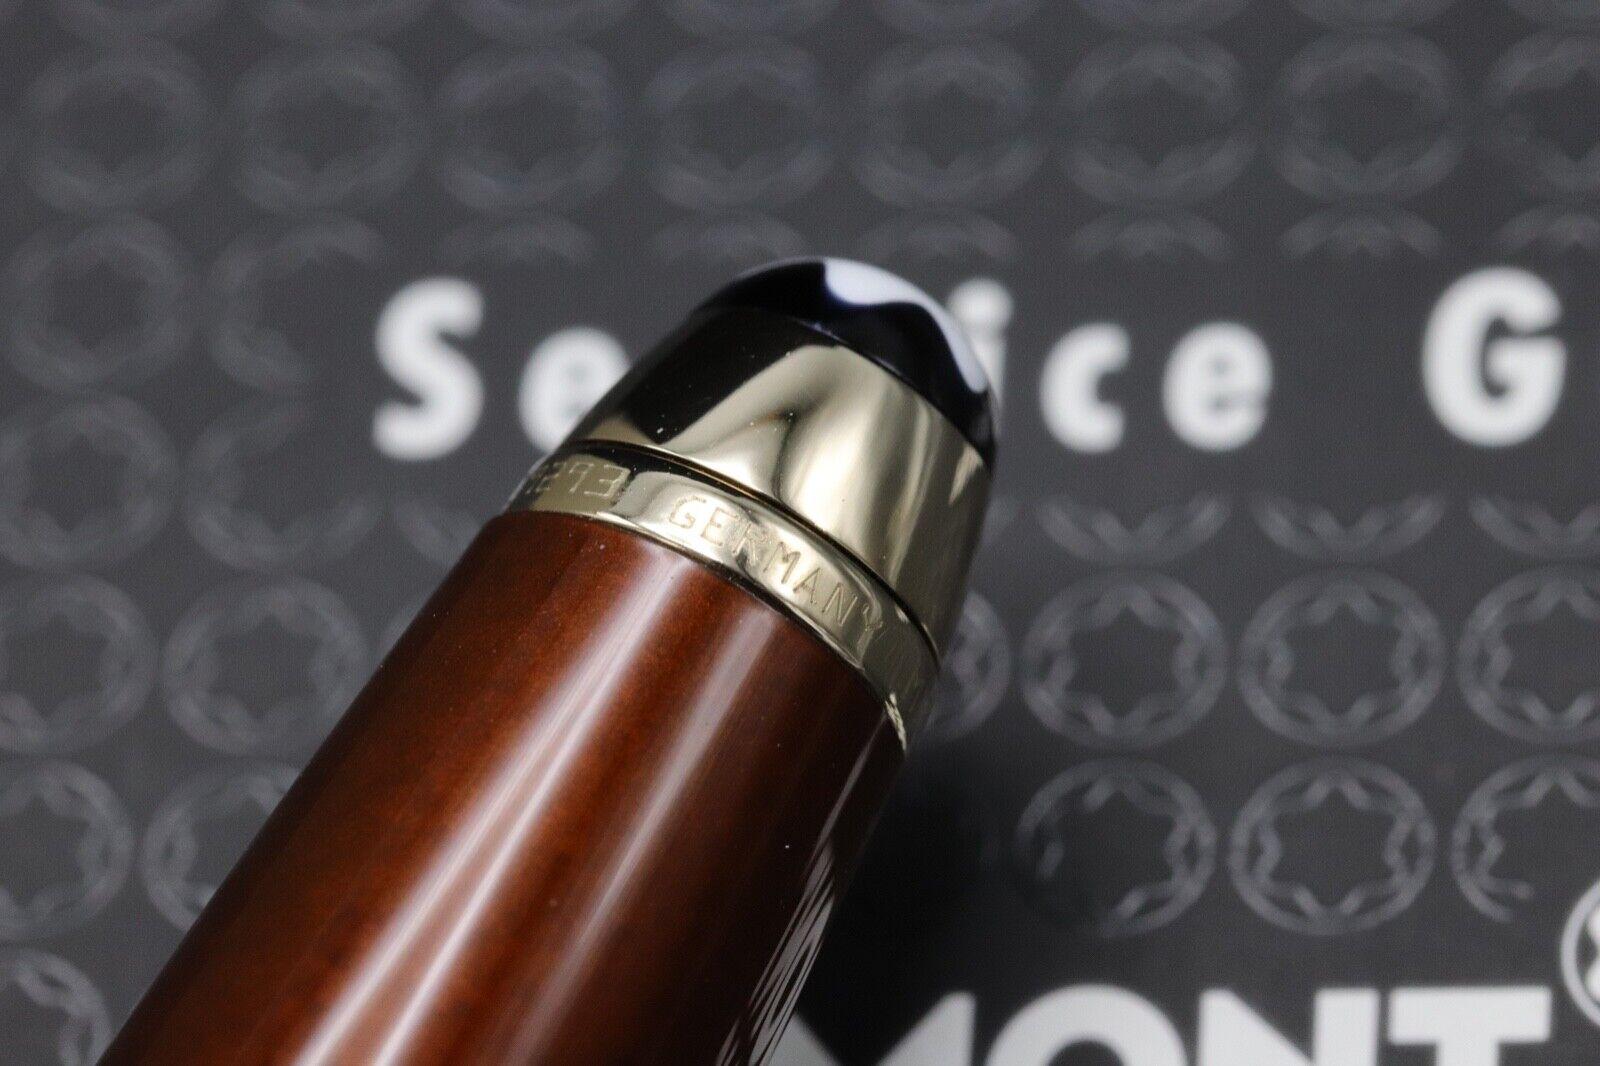 Montblanc Meisterstuck 163 Classique Solitaire Citrine Rollerball Pen 5